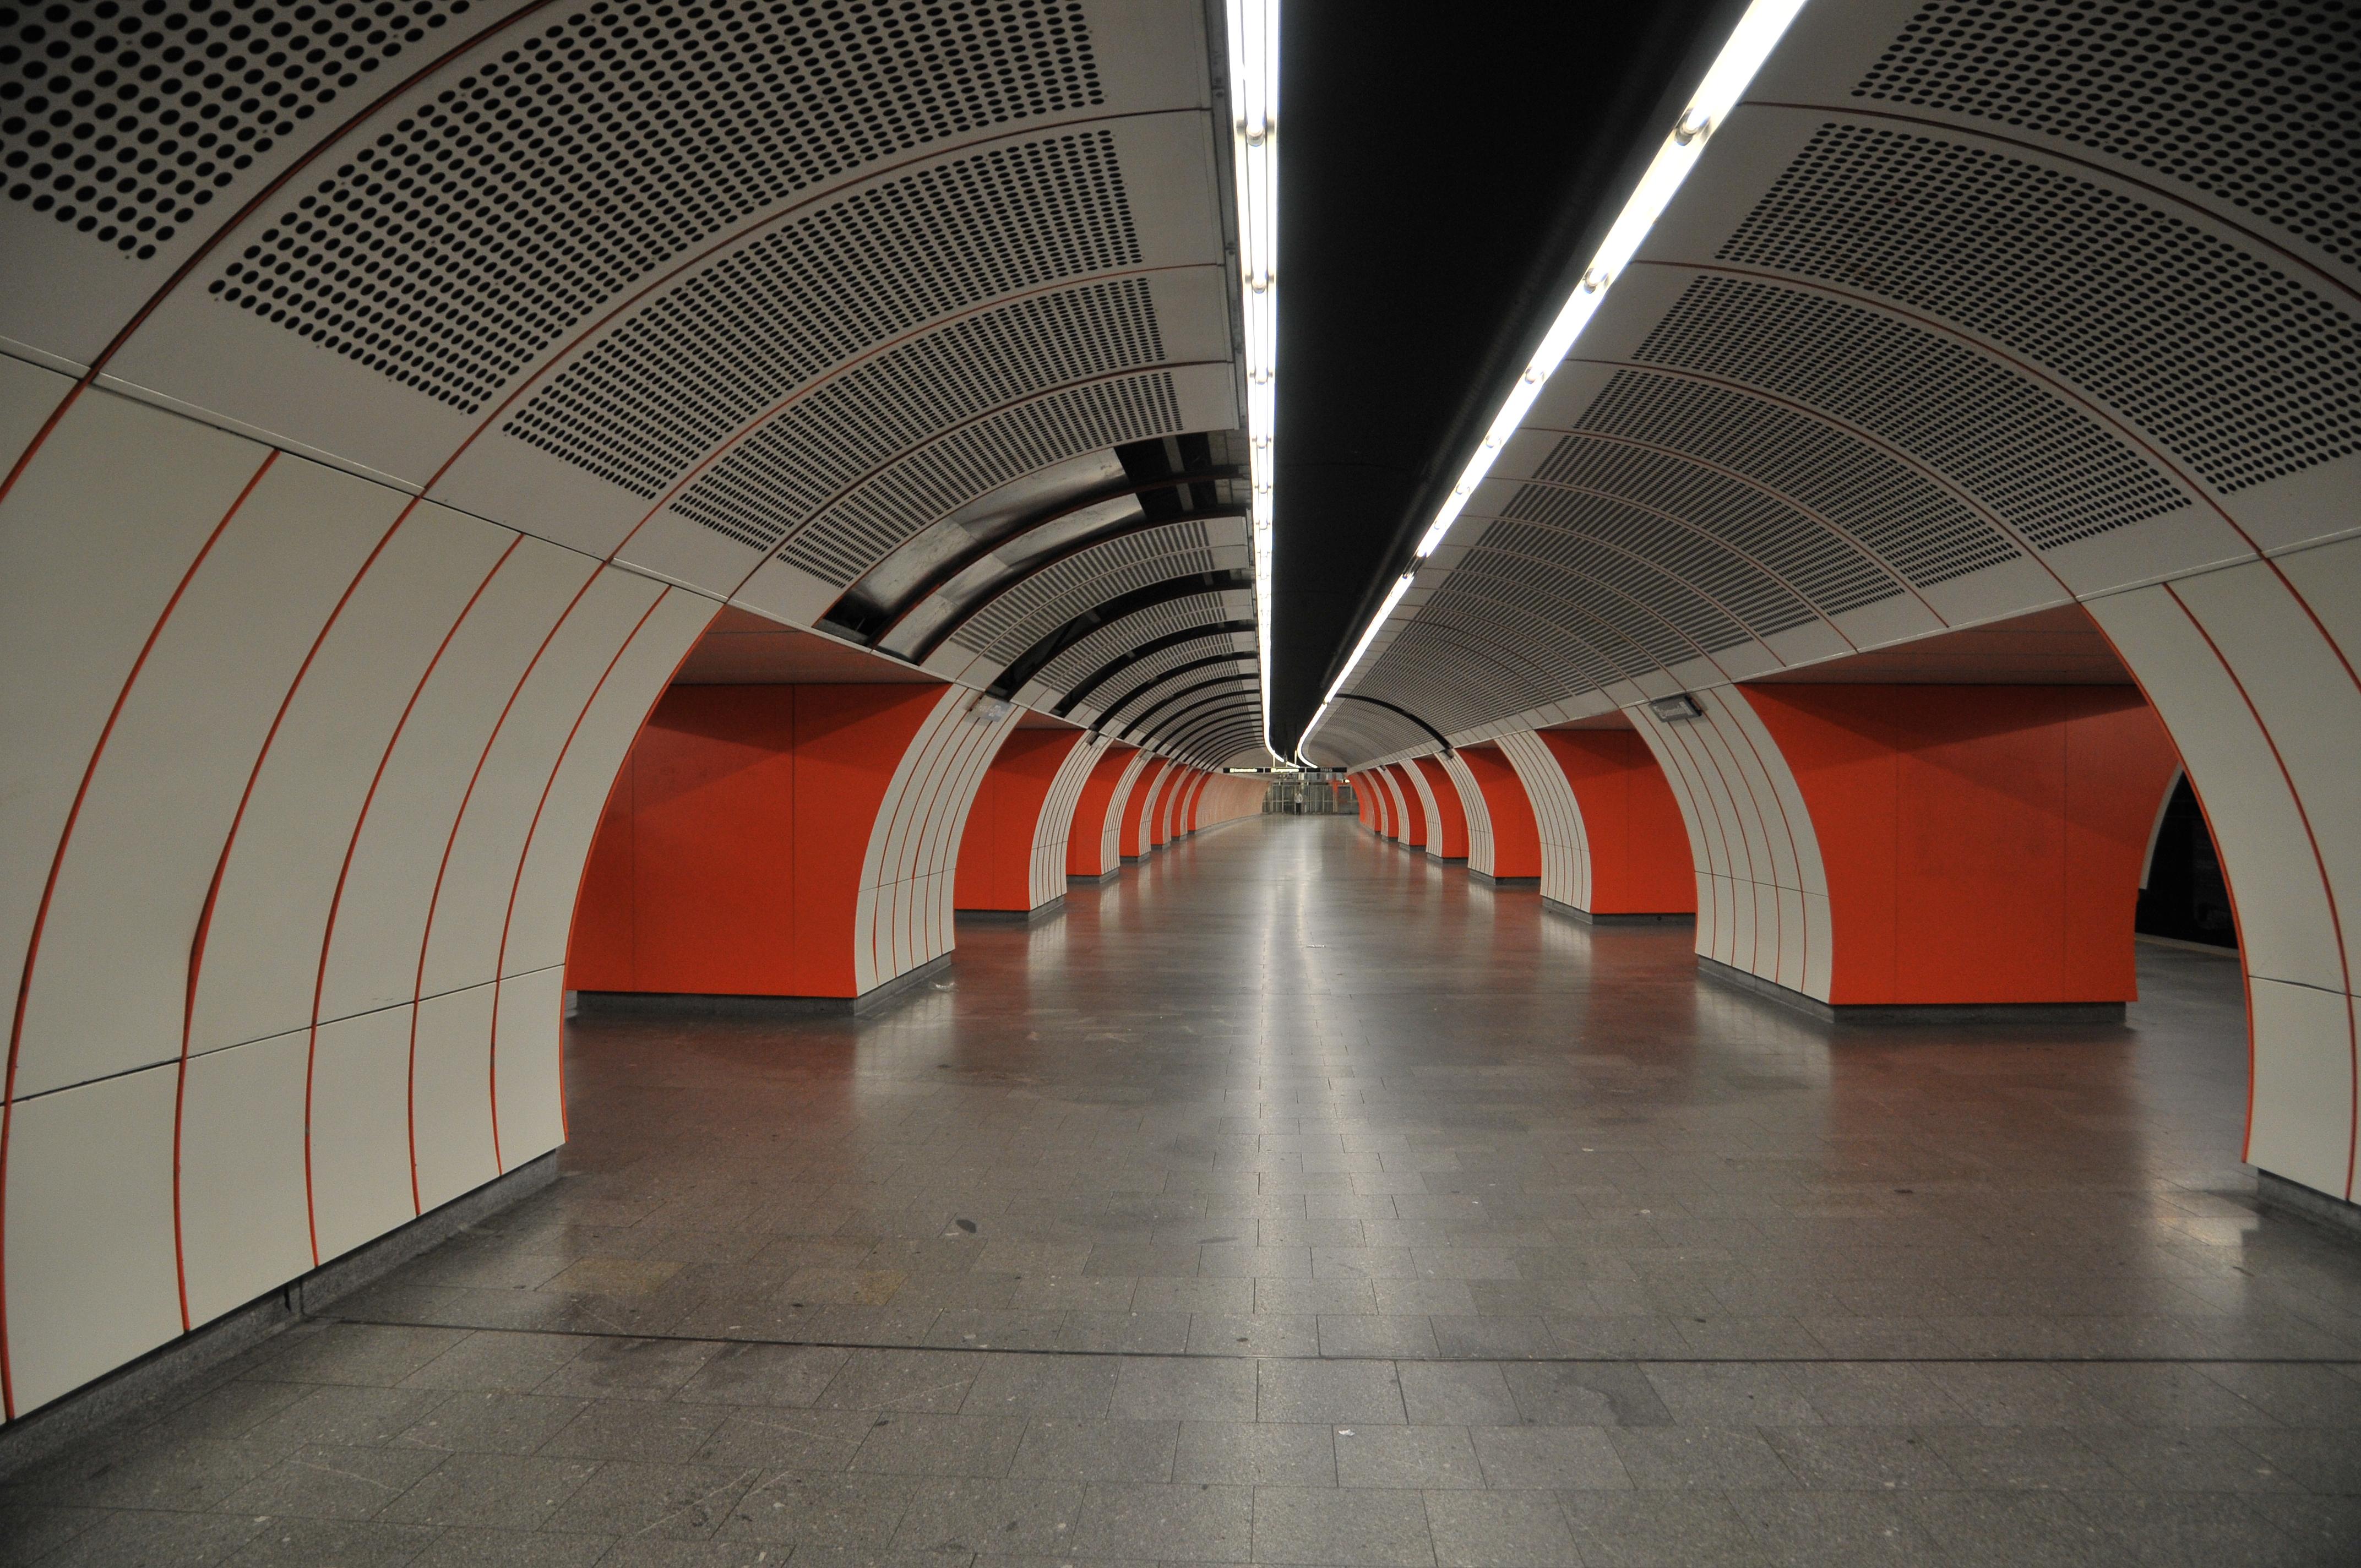 Fileu Bahn Station Westbahnhof 2012jpg Wikimedia Commons